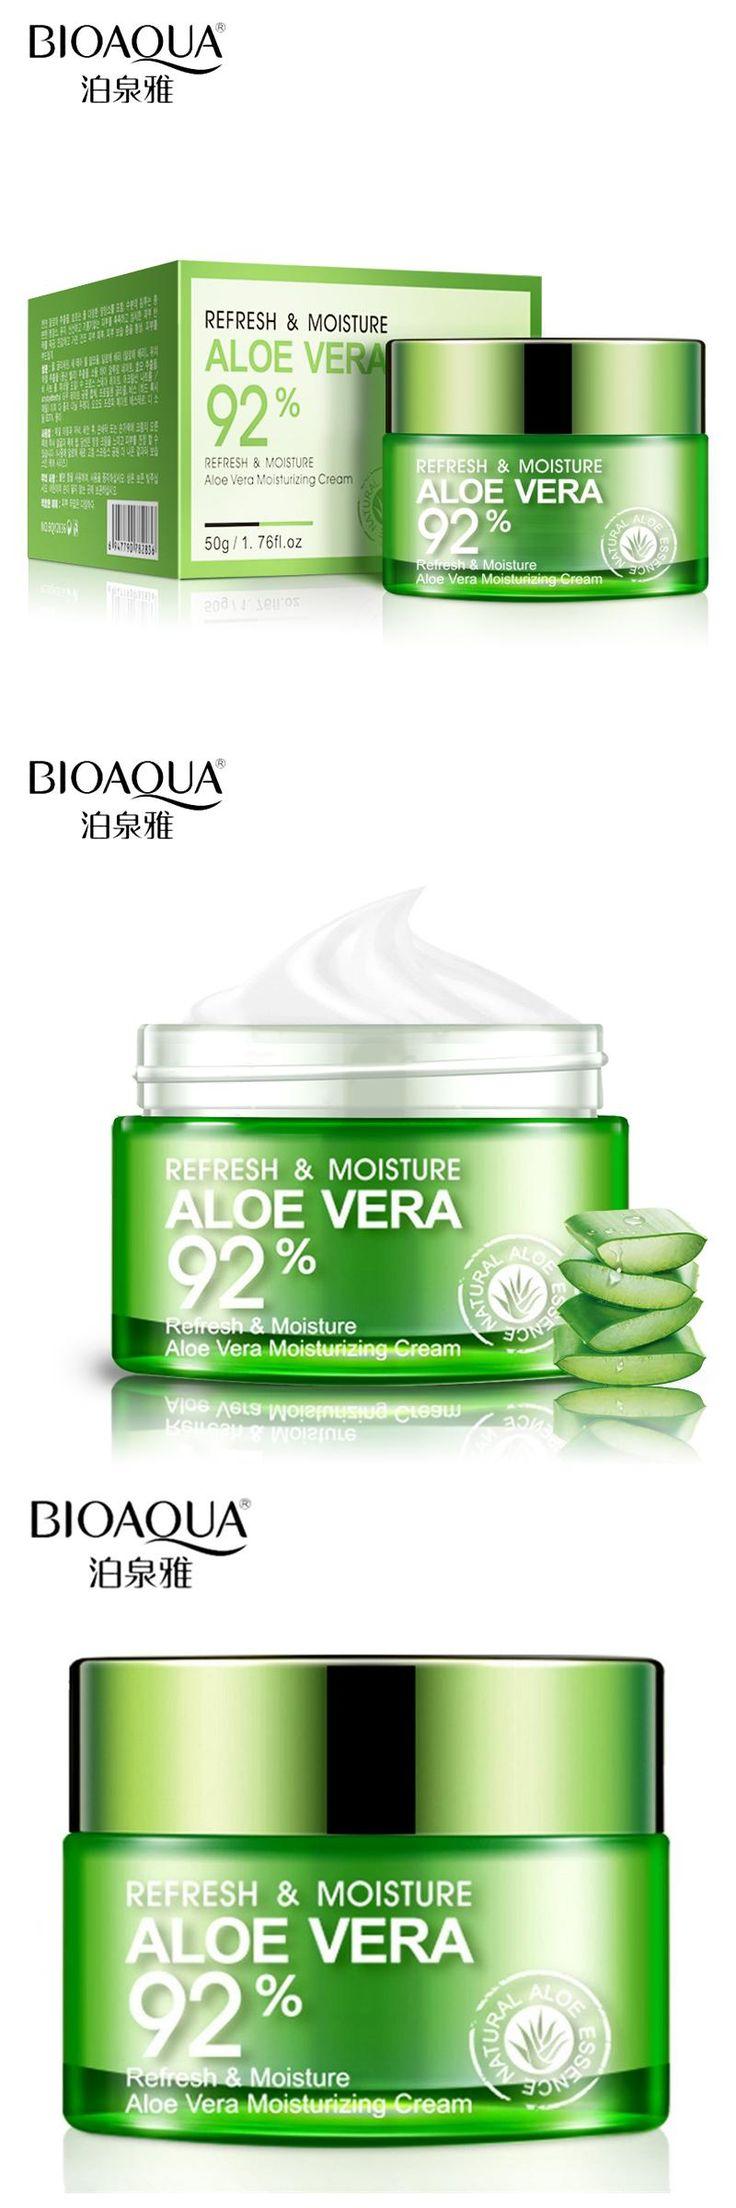 [Visit to Buy] BIOAQUA Brand Skin Care Serum Aloe Vera Gel Deep Hydrating Moisturizing Whitening Face Cream Anti-Aging Day Cream Face Mask 50g #Advertisement